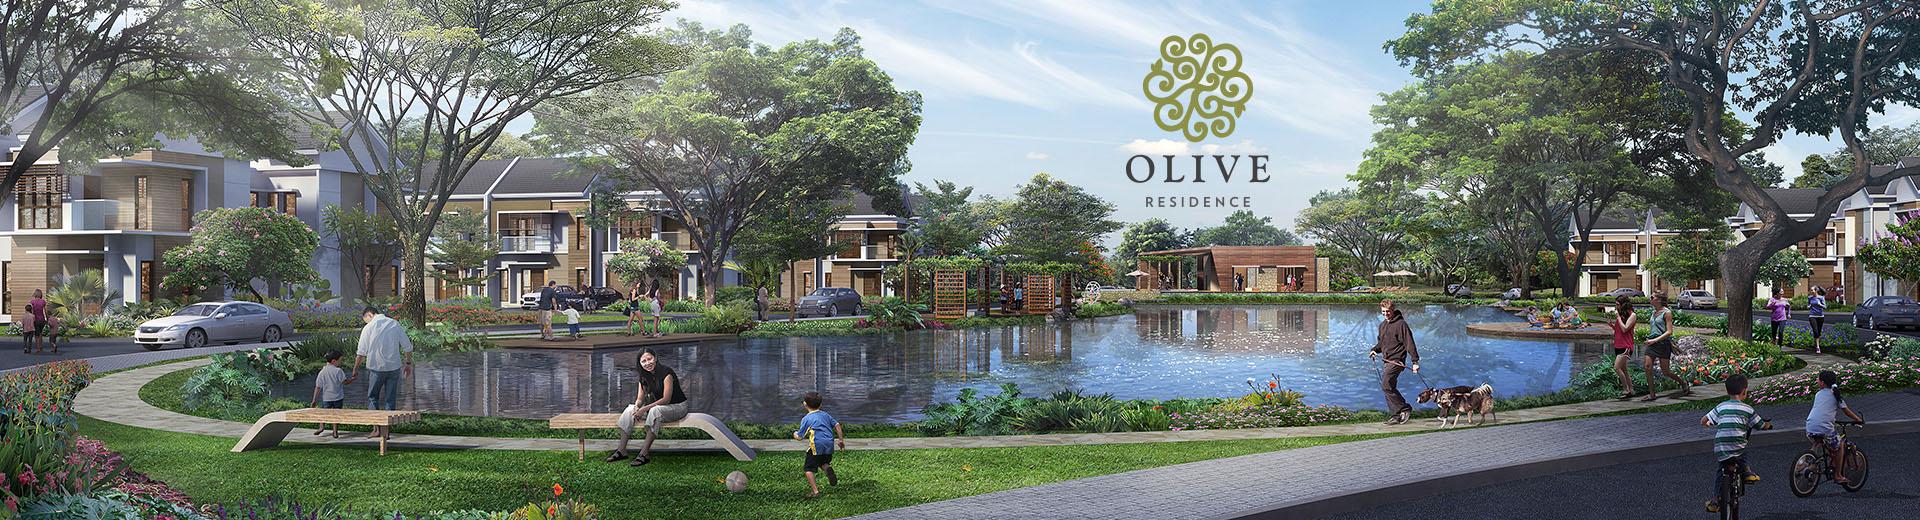 banner-olive-residence-1